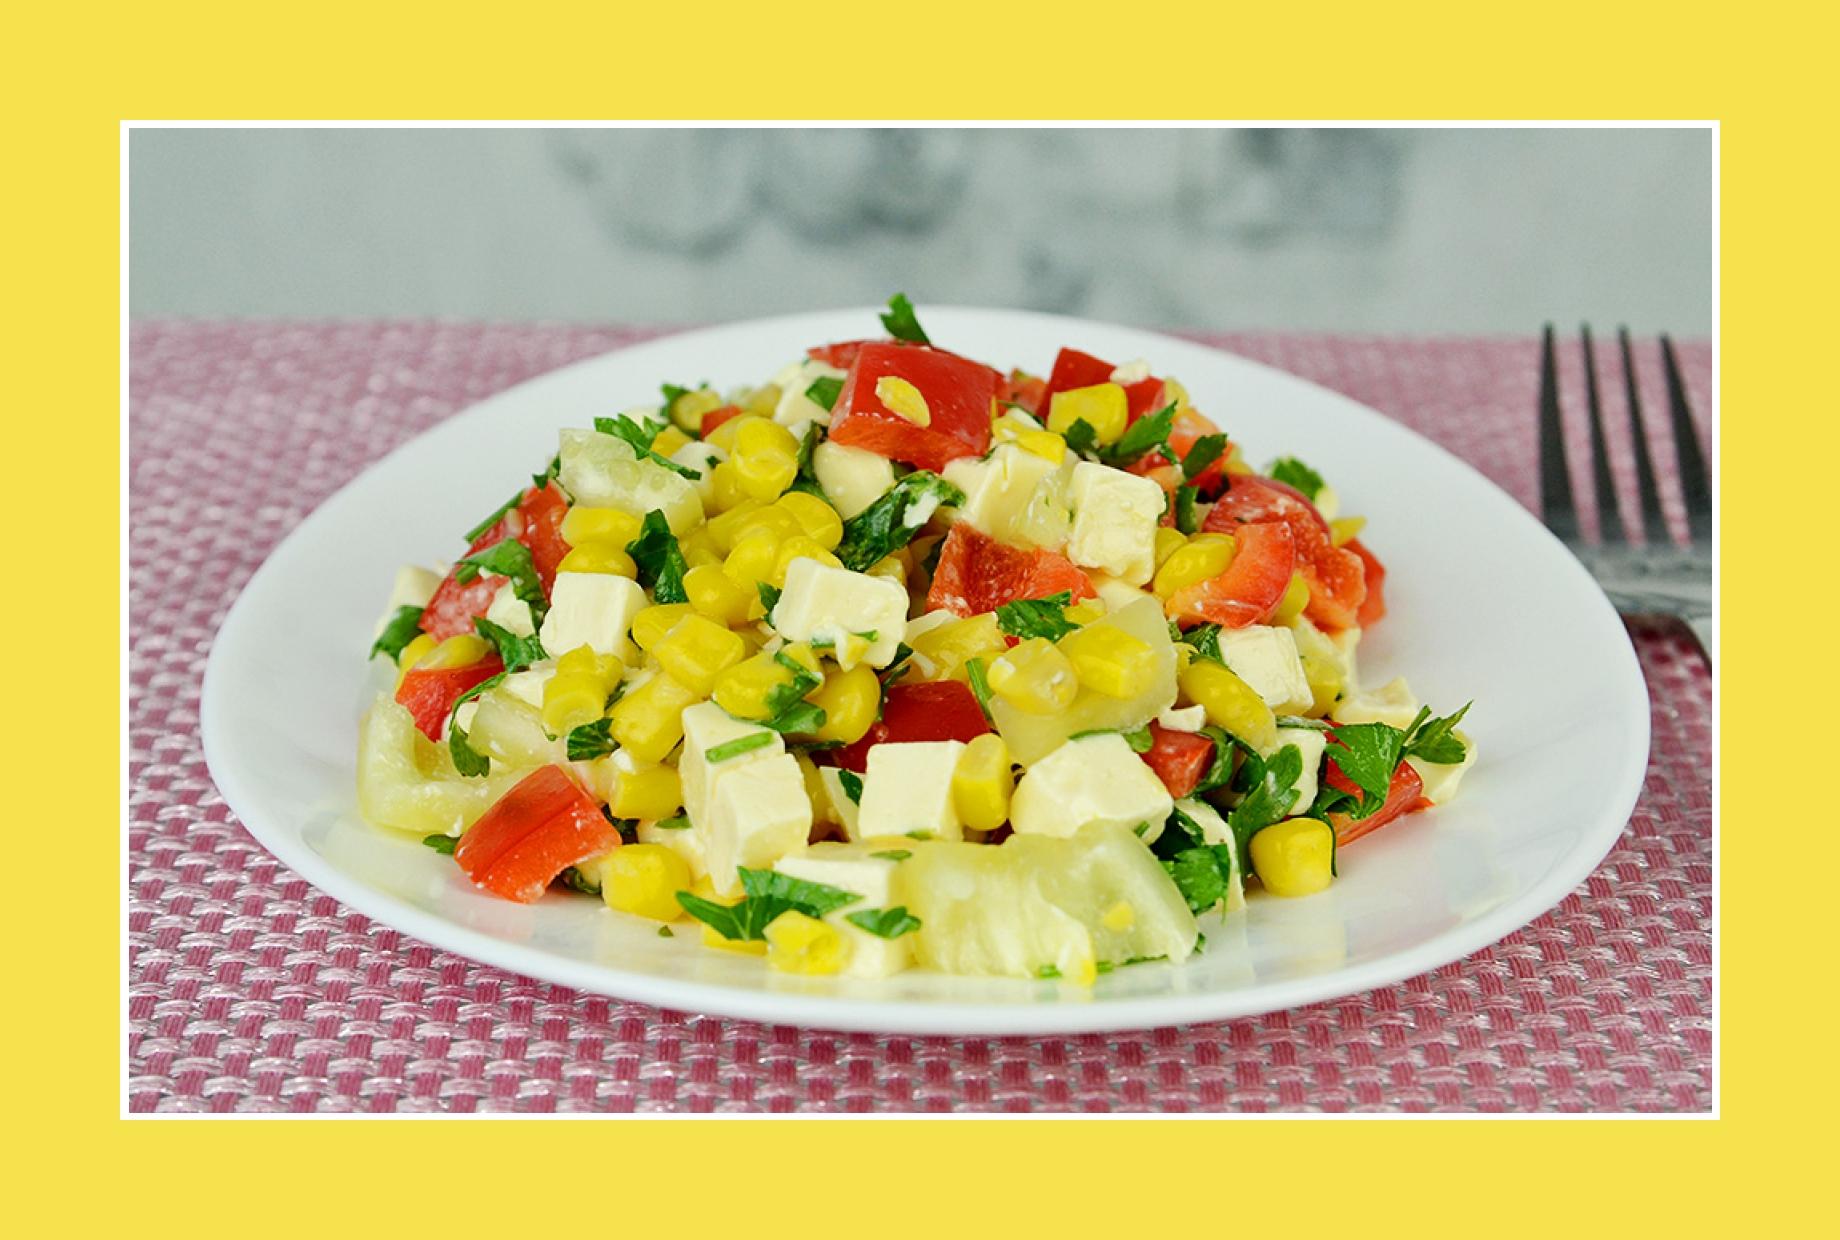 Bunter Salat mit Mais, Paprika, Käse